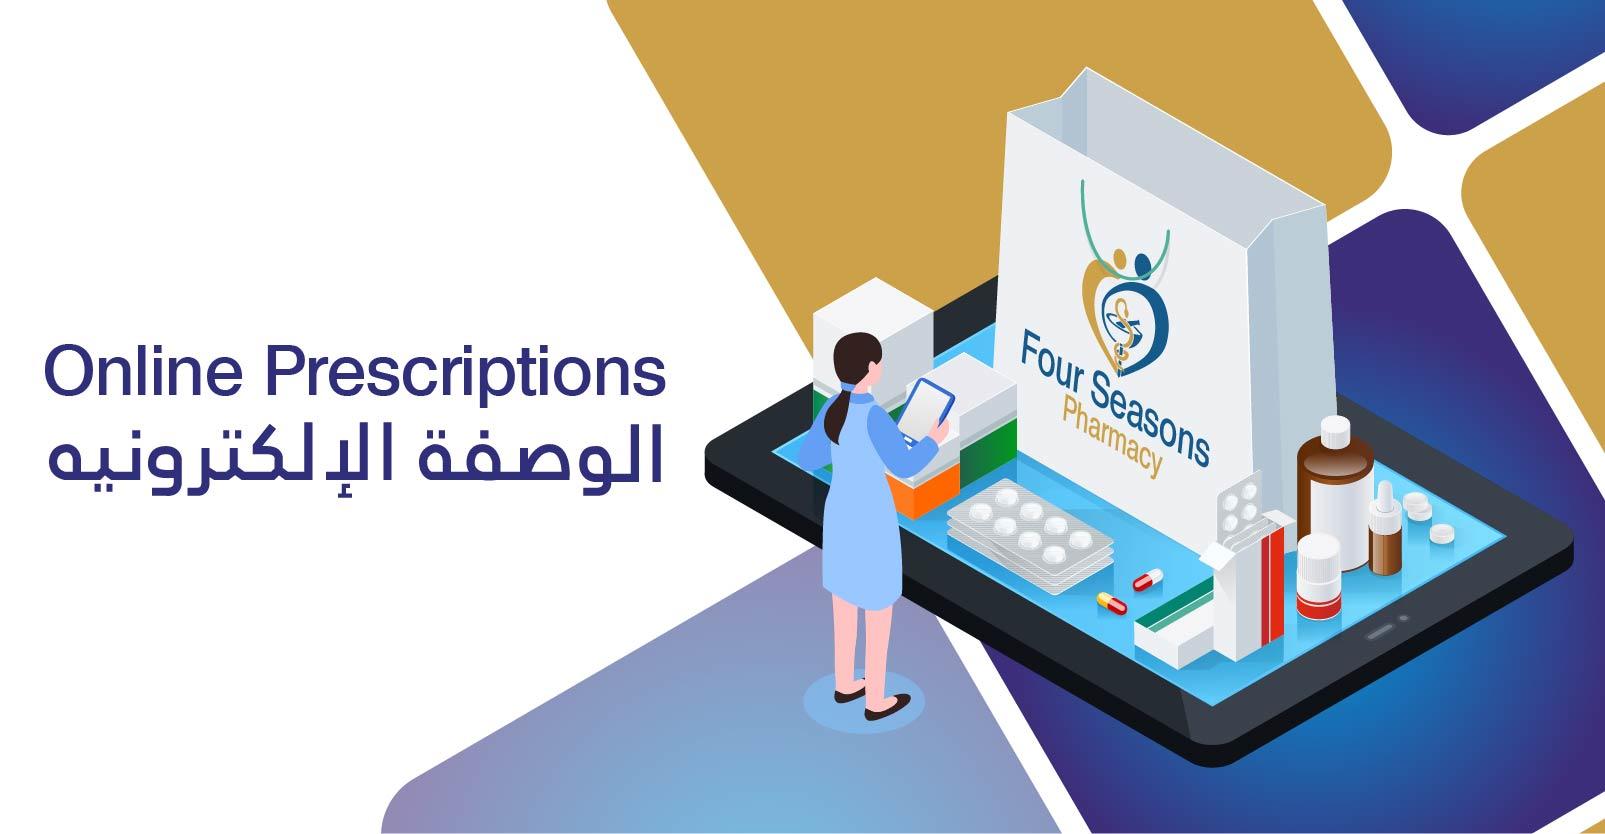 Dispense Online Prescriptions with Medical Insurance Online